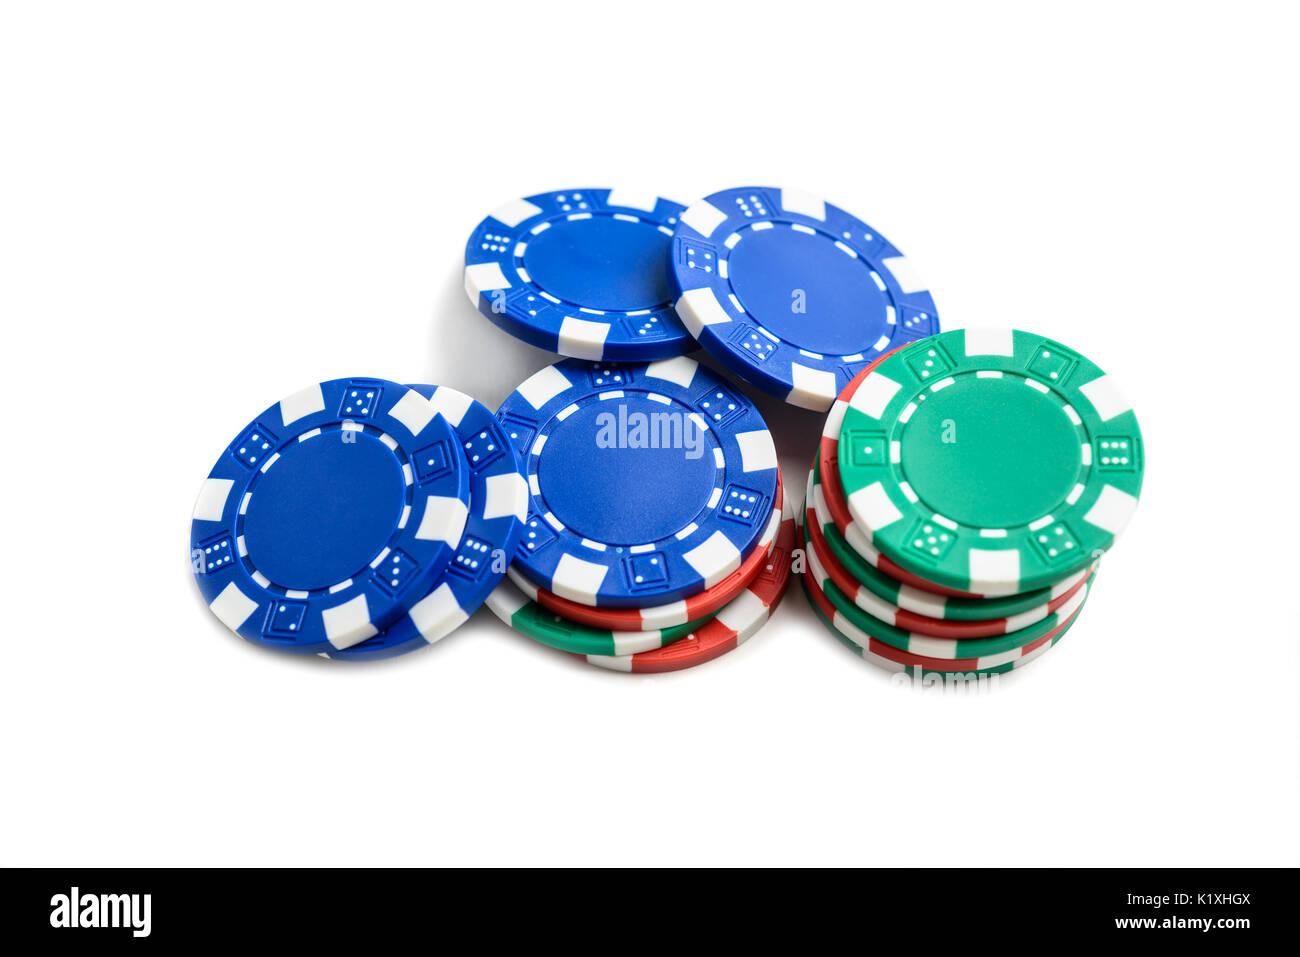 Casino poker chips aislado sobre fondo blanco. Imagen De Stock